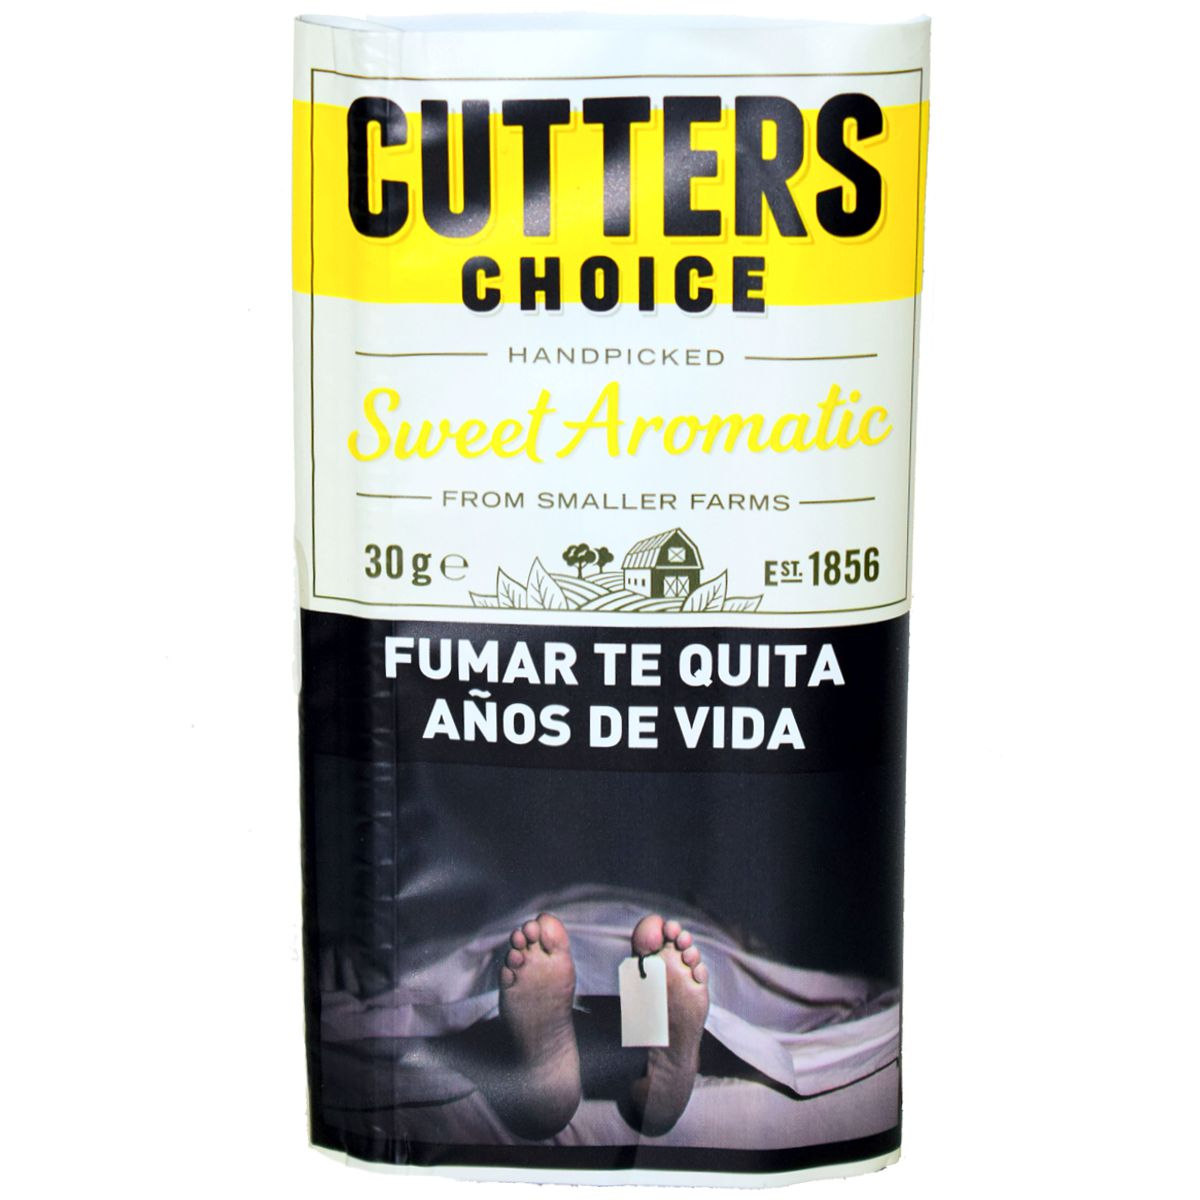 tabaco cutters sweet aromatic precio